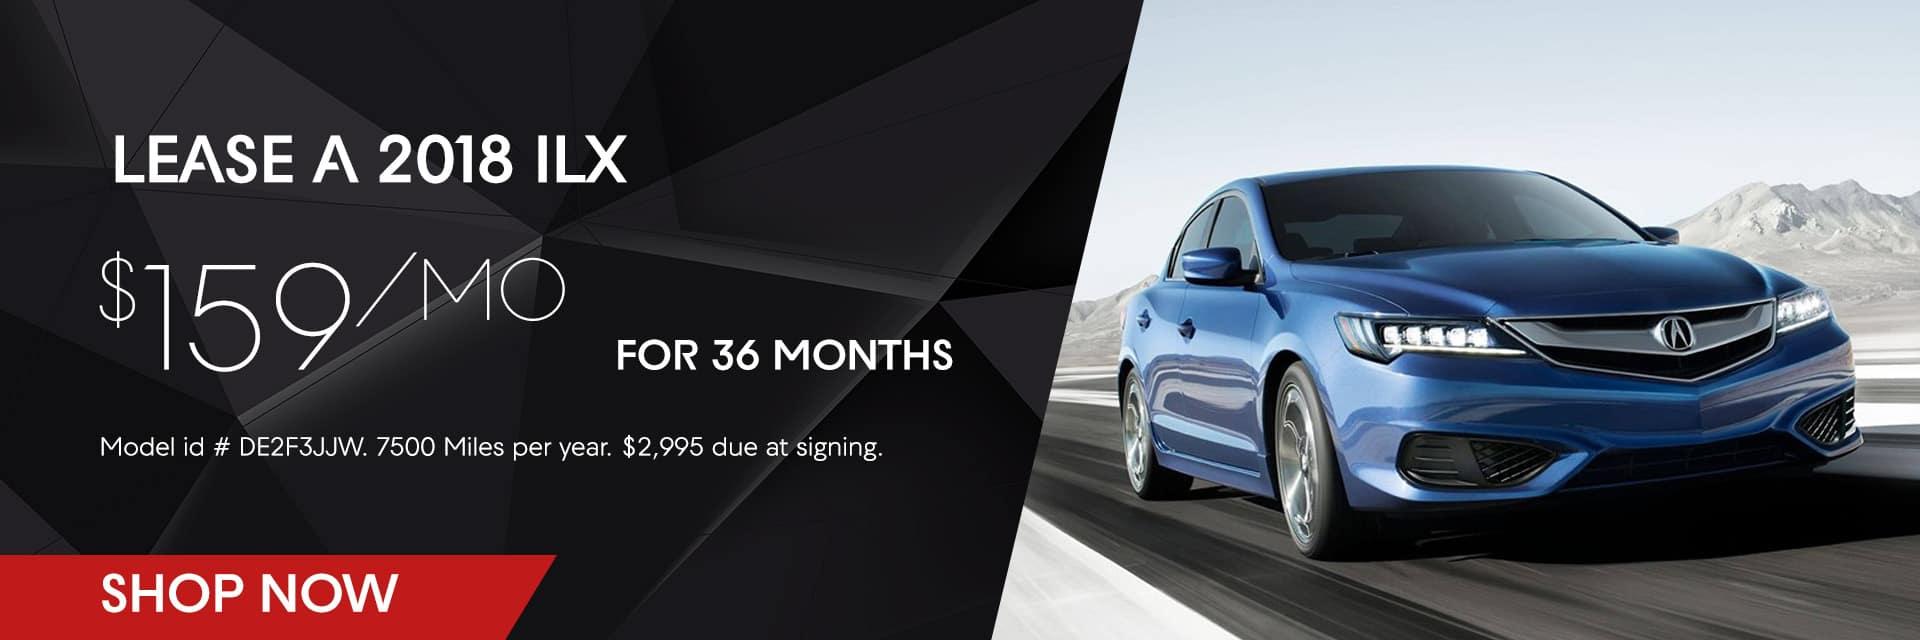 McGrath Acura Chicago February ILX Offer